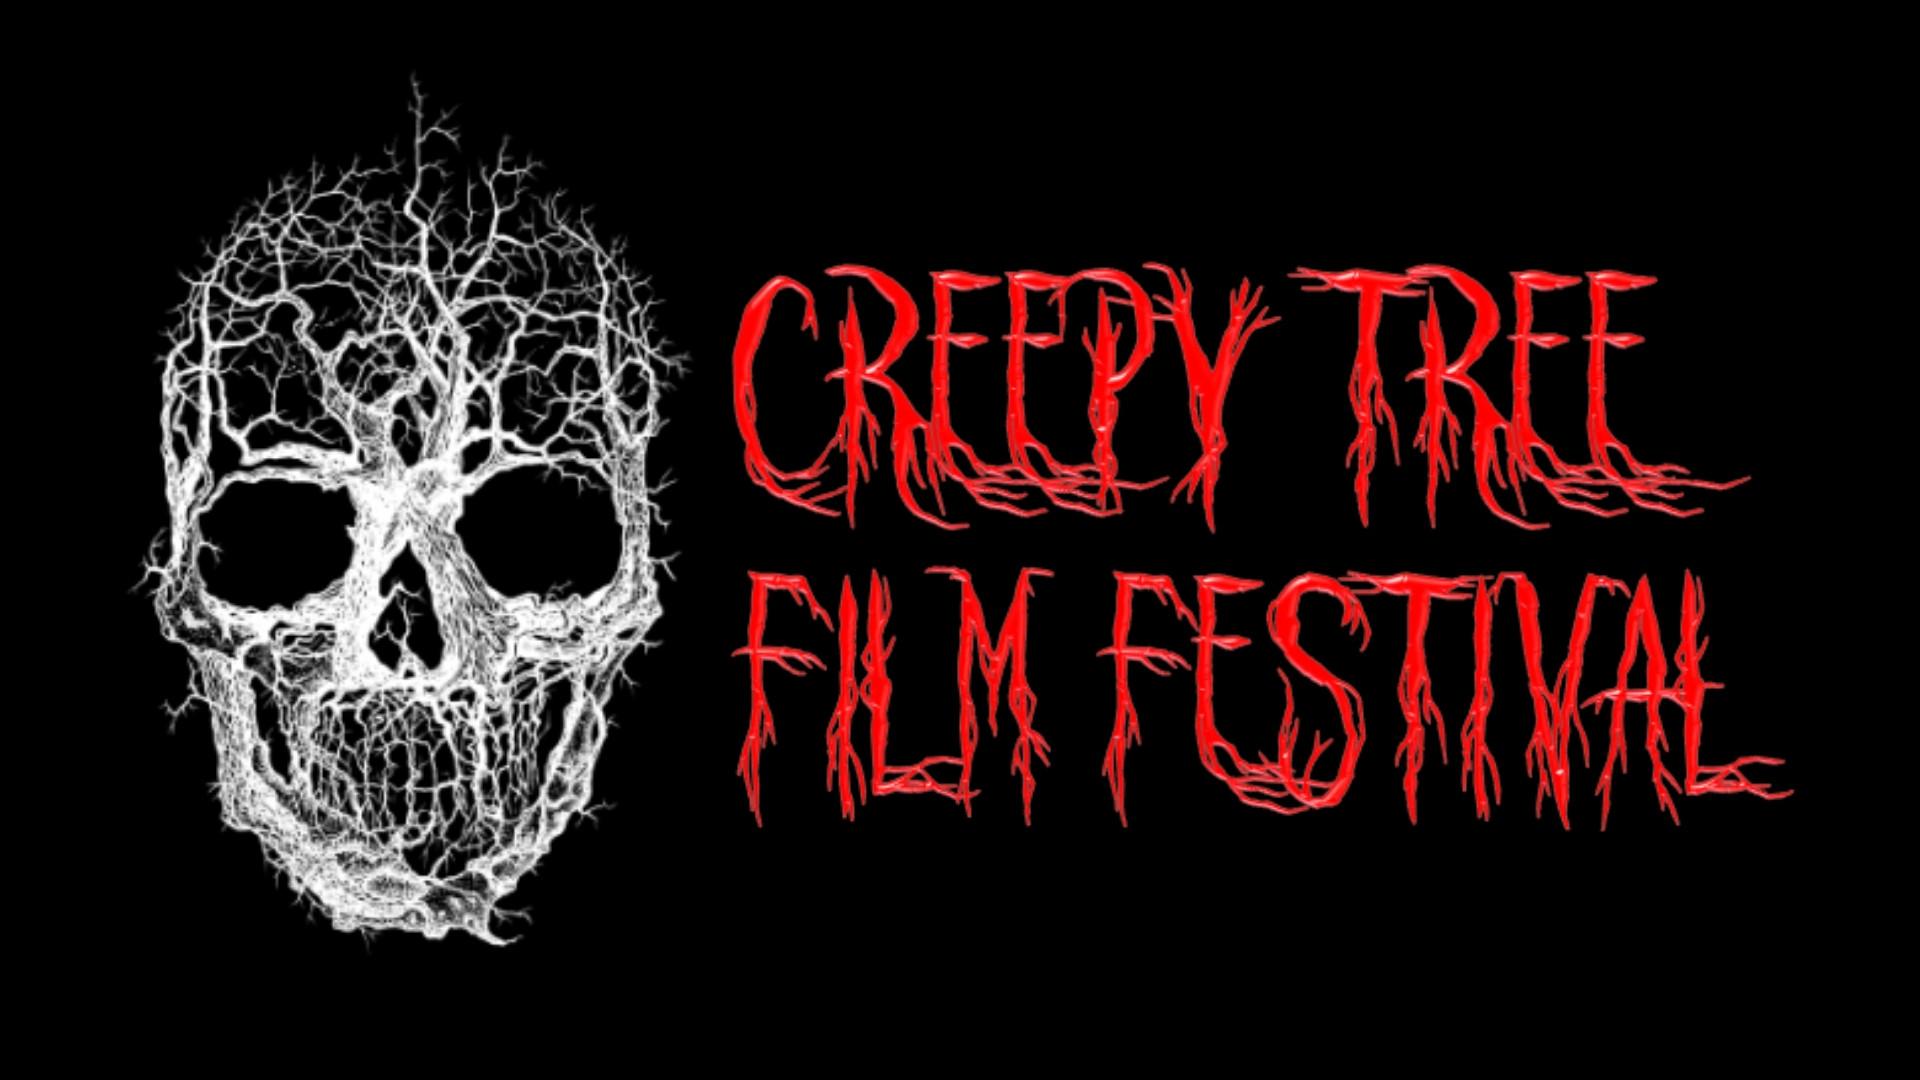 ADVANCED TECHNIQUES | Creepy Tree Film Festival